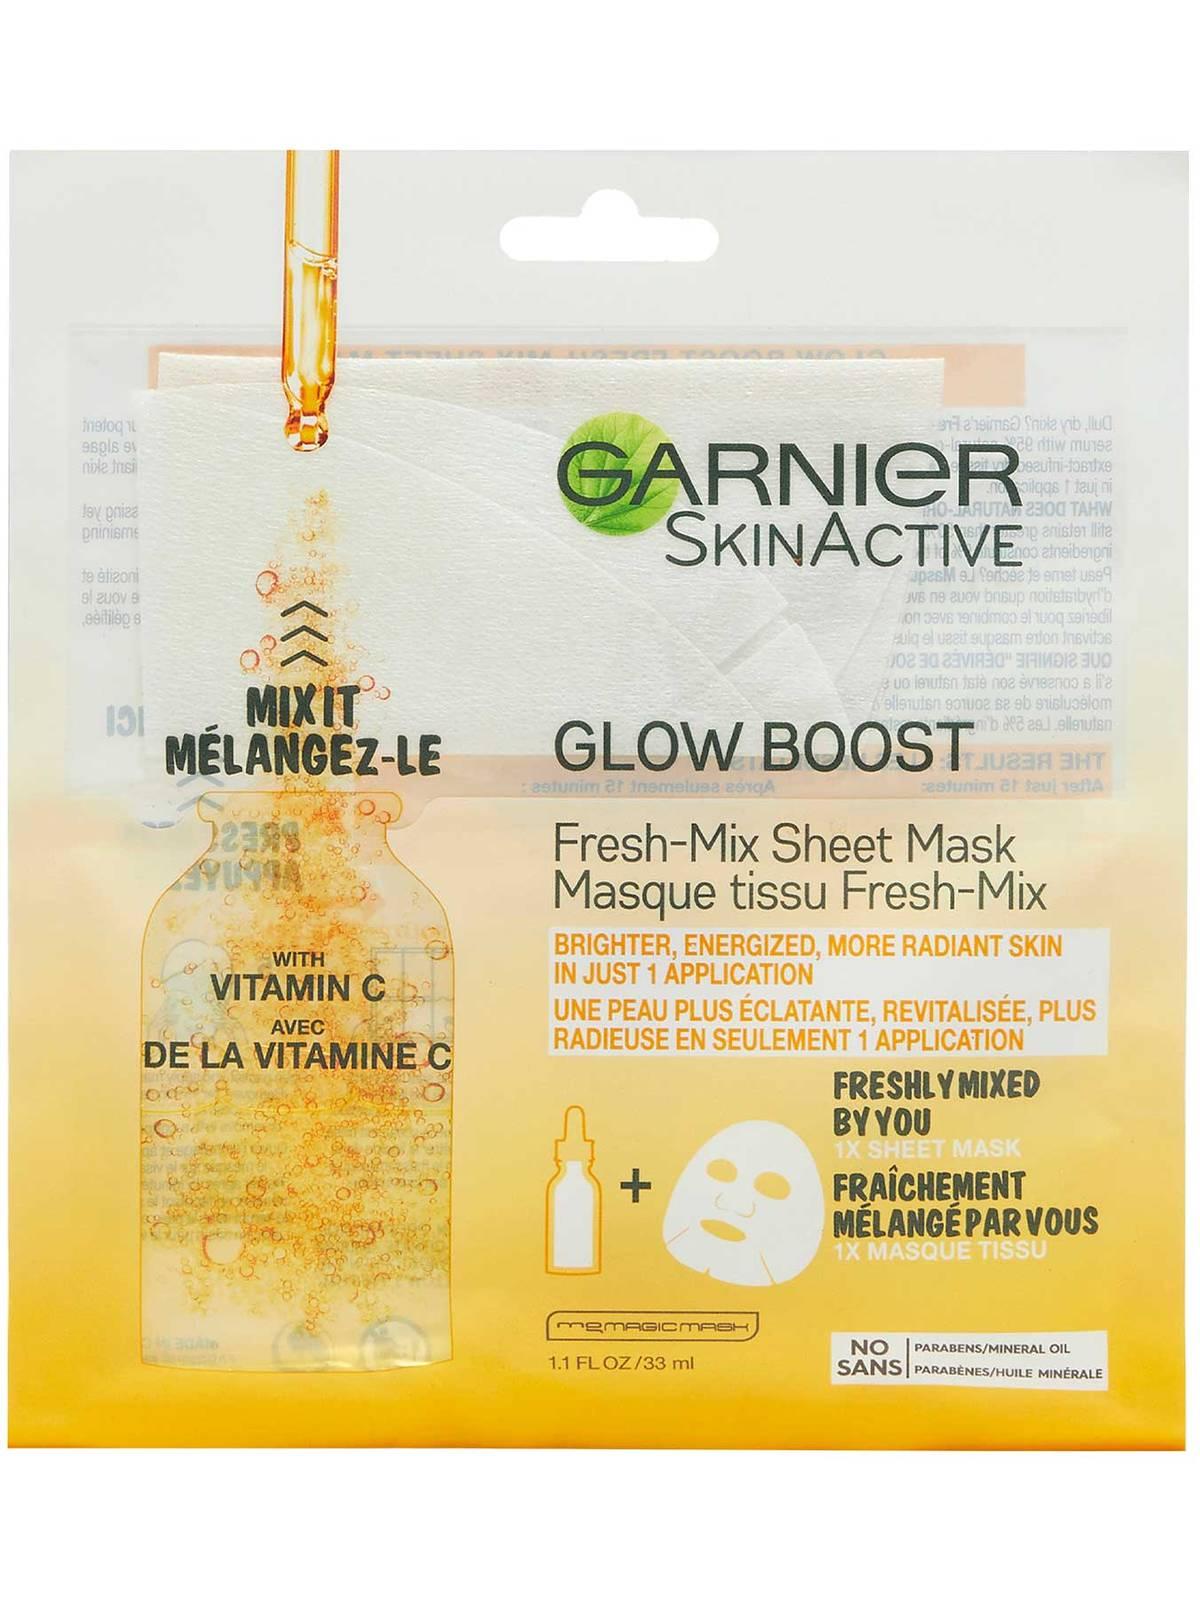 Garnier SkinActive Glow Boost Fresh-Mix Sheet Mask with Vitamin C